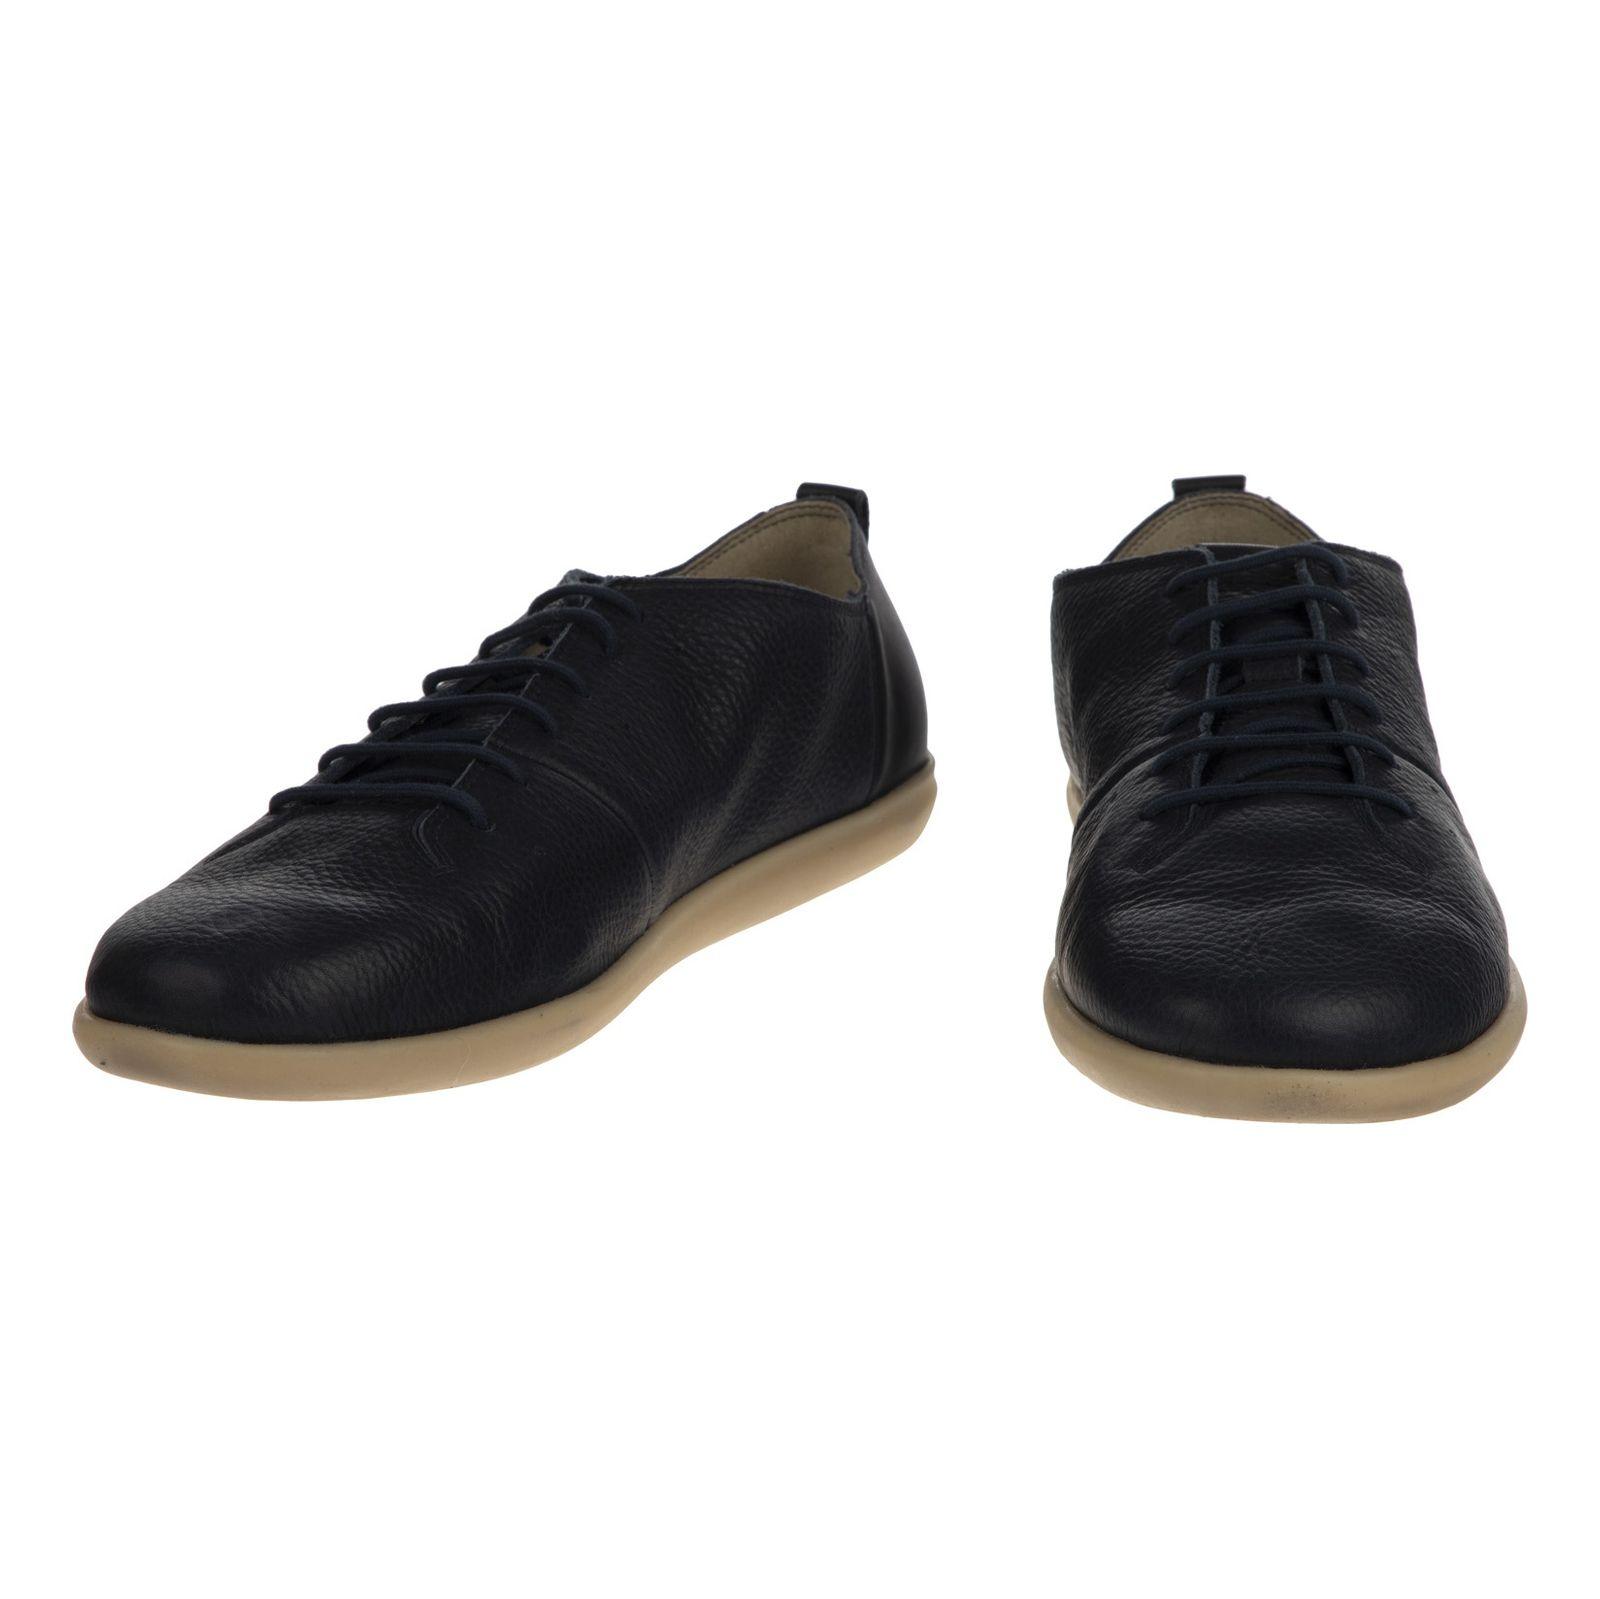 کفش روزمره مردانه جی اوکس مدل U620QB-04643-C4002 -  - 5